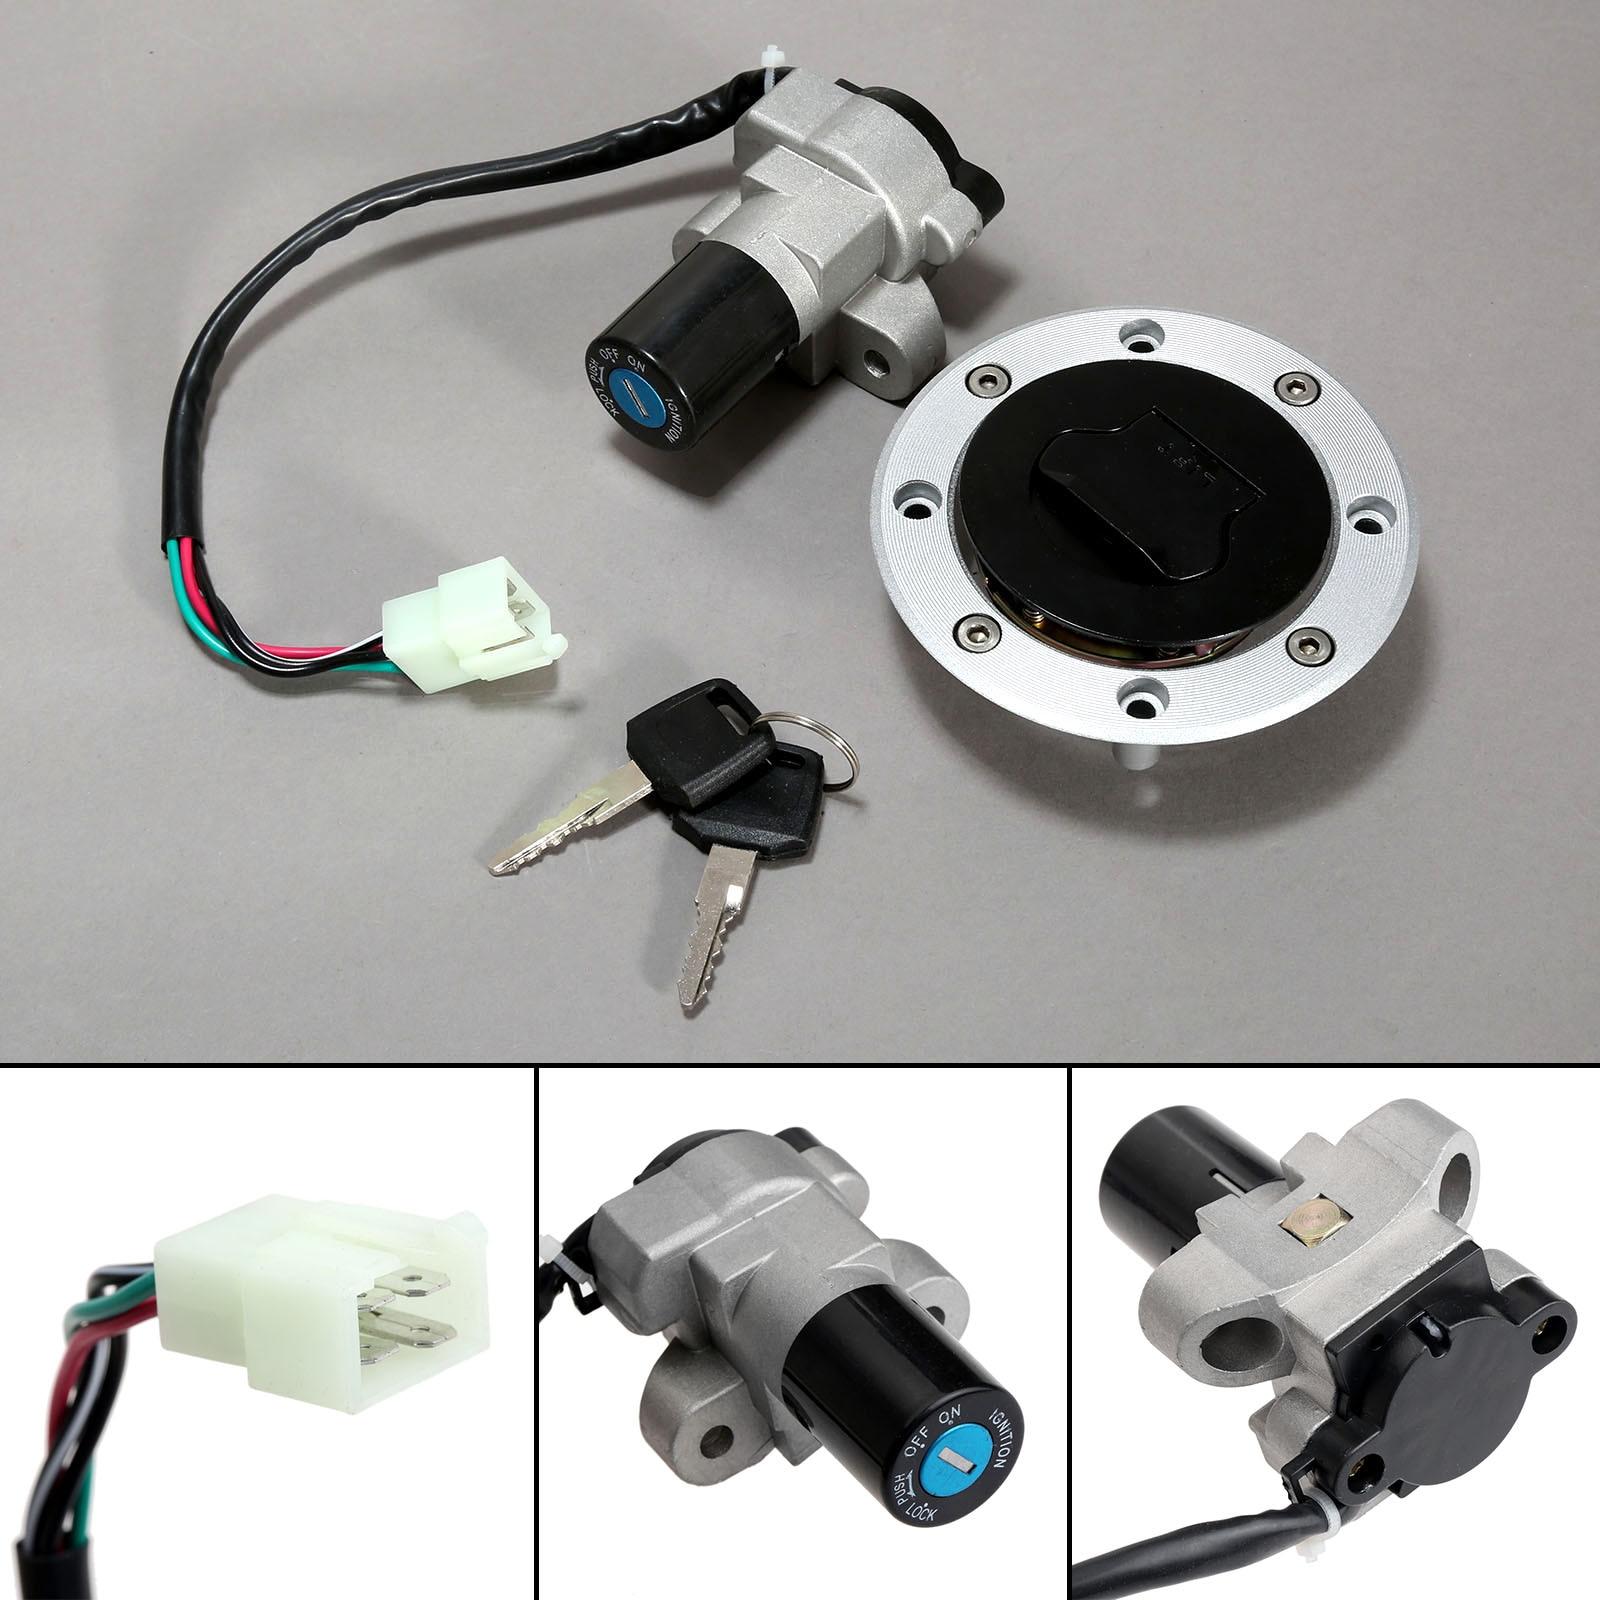 Motorcycle Ignition Switch Lock Fuel Gas Cap Keys For Suzuki RF400 RF600 RF900 RGV250 Gamma VJ21 VJ22 VJ23 GSX750 GSX600 VX800